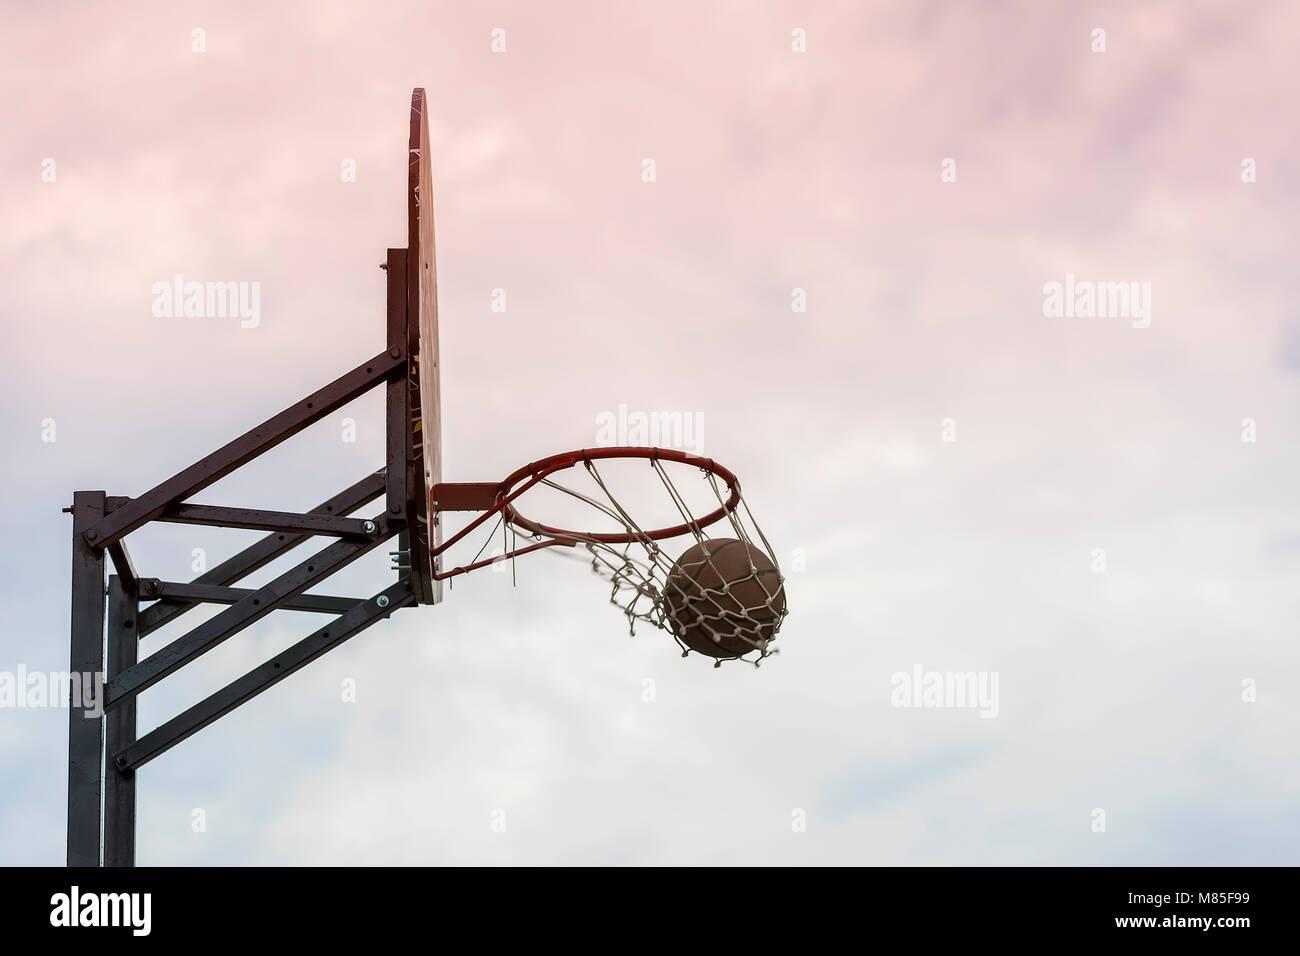 street basketball game basketball shield ball going through basket